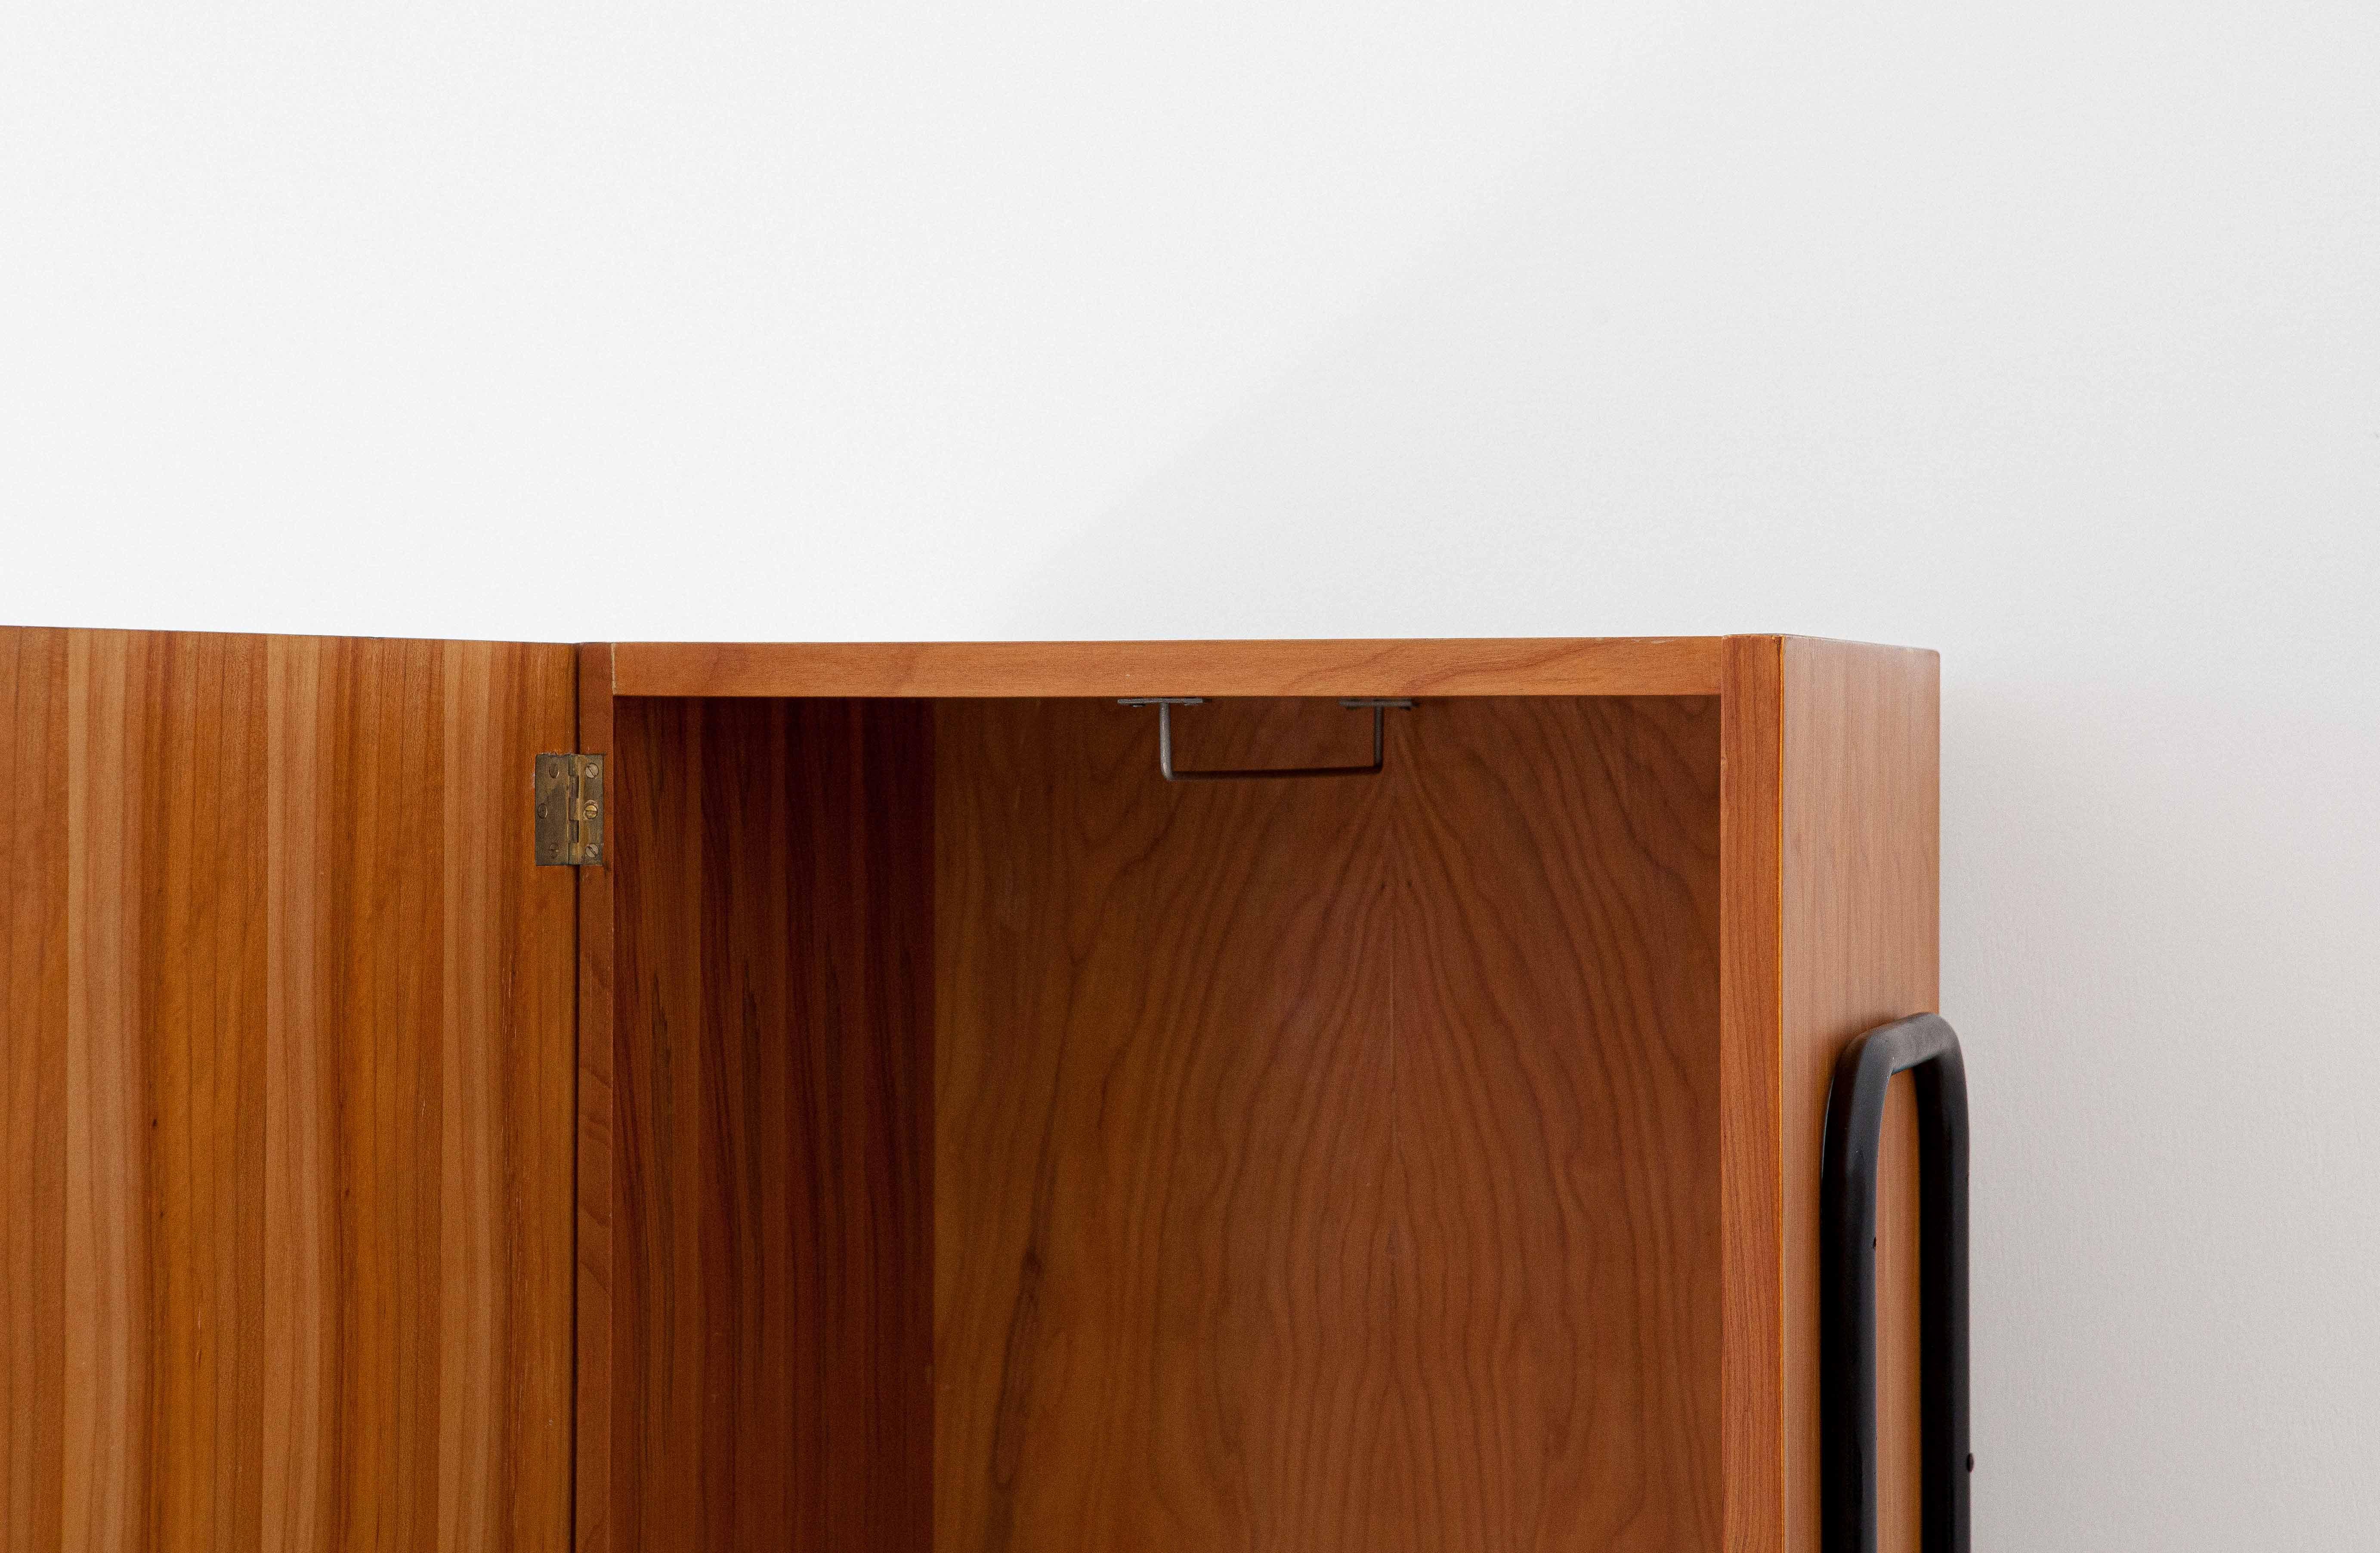 1950s-italian-light-wood-and-iron-wardrobe-cabinet-6-st114